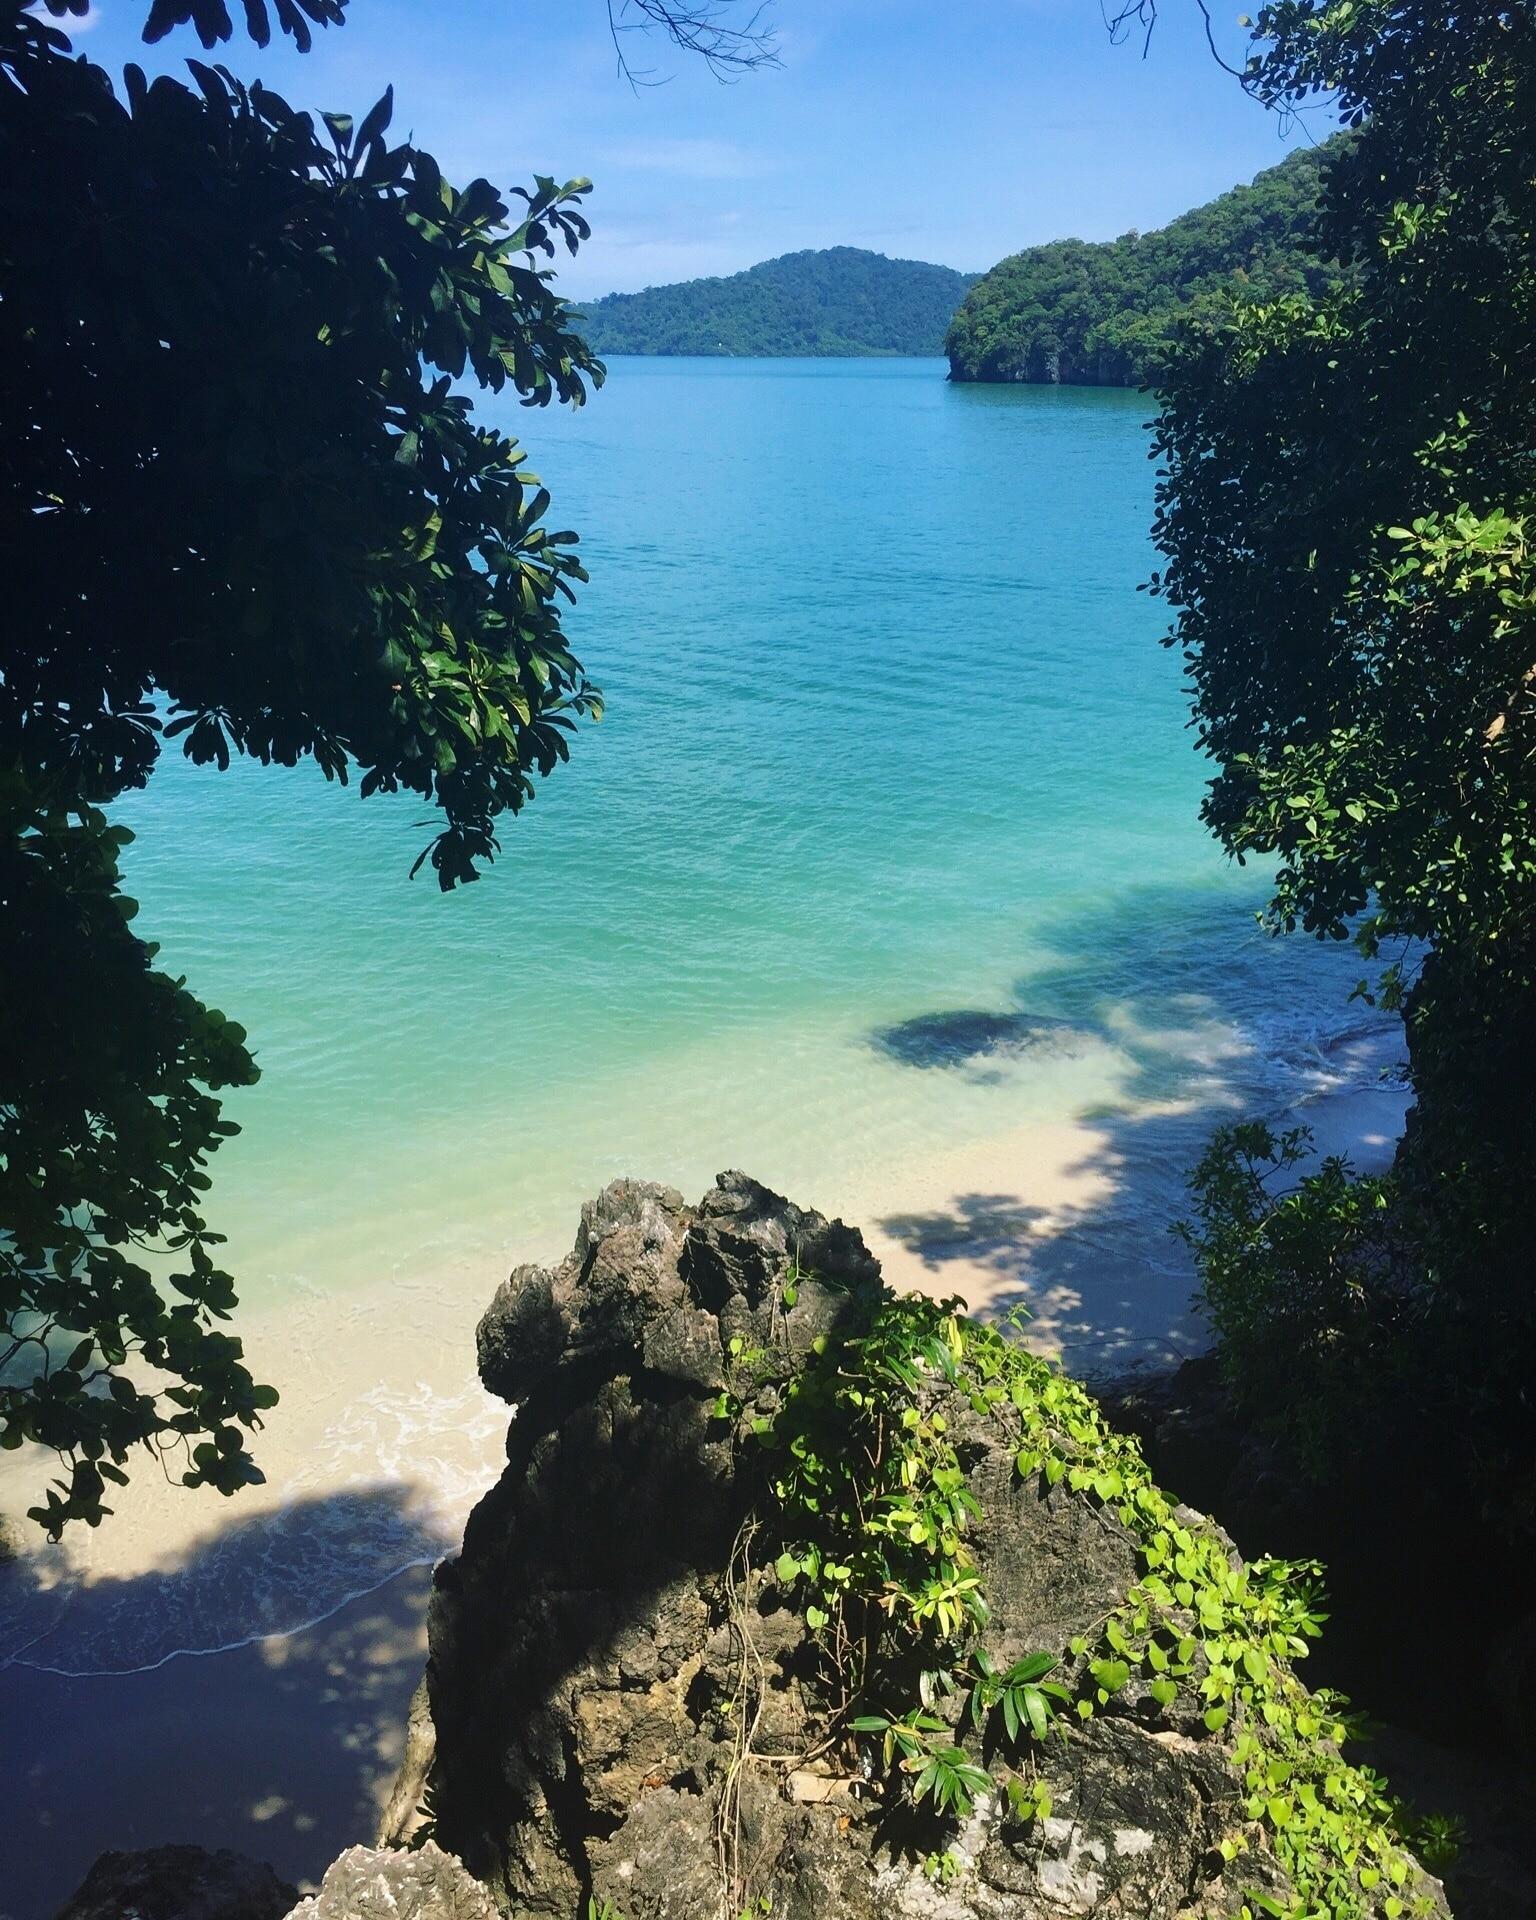 Pulau Dayang Bunting, Kedah, Malaysia